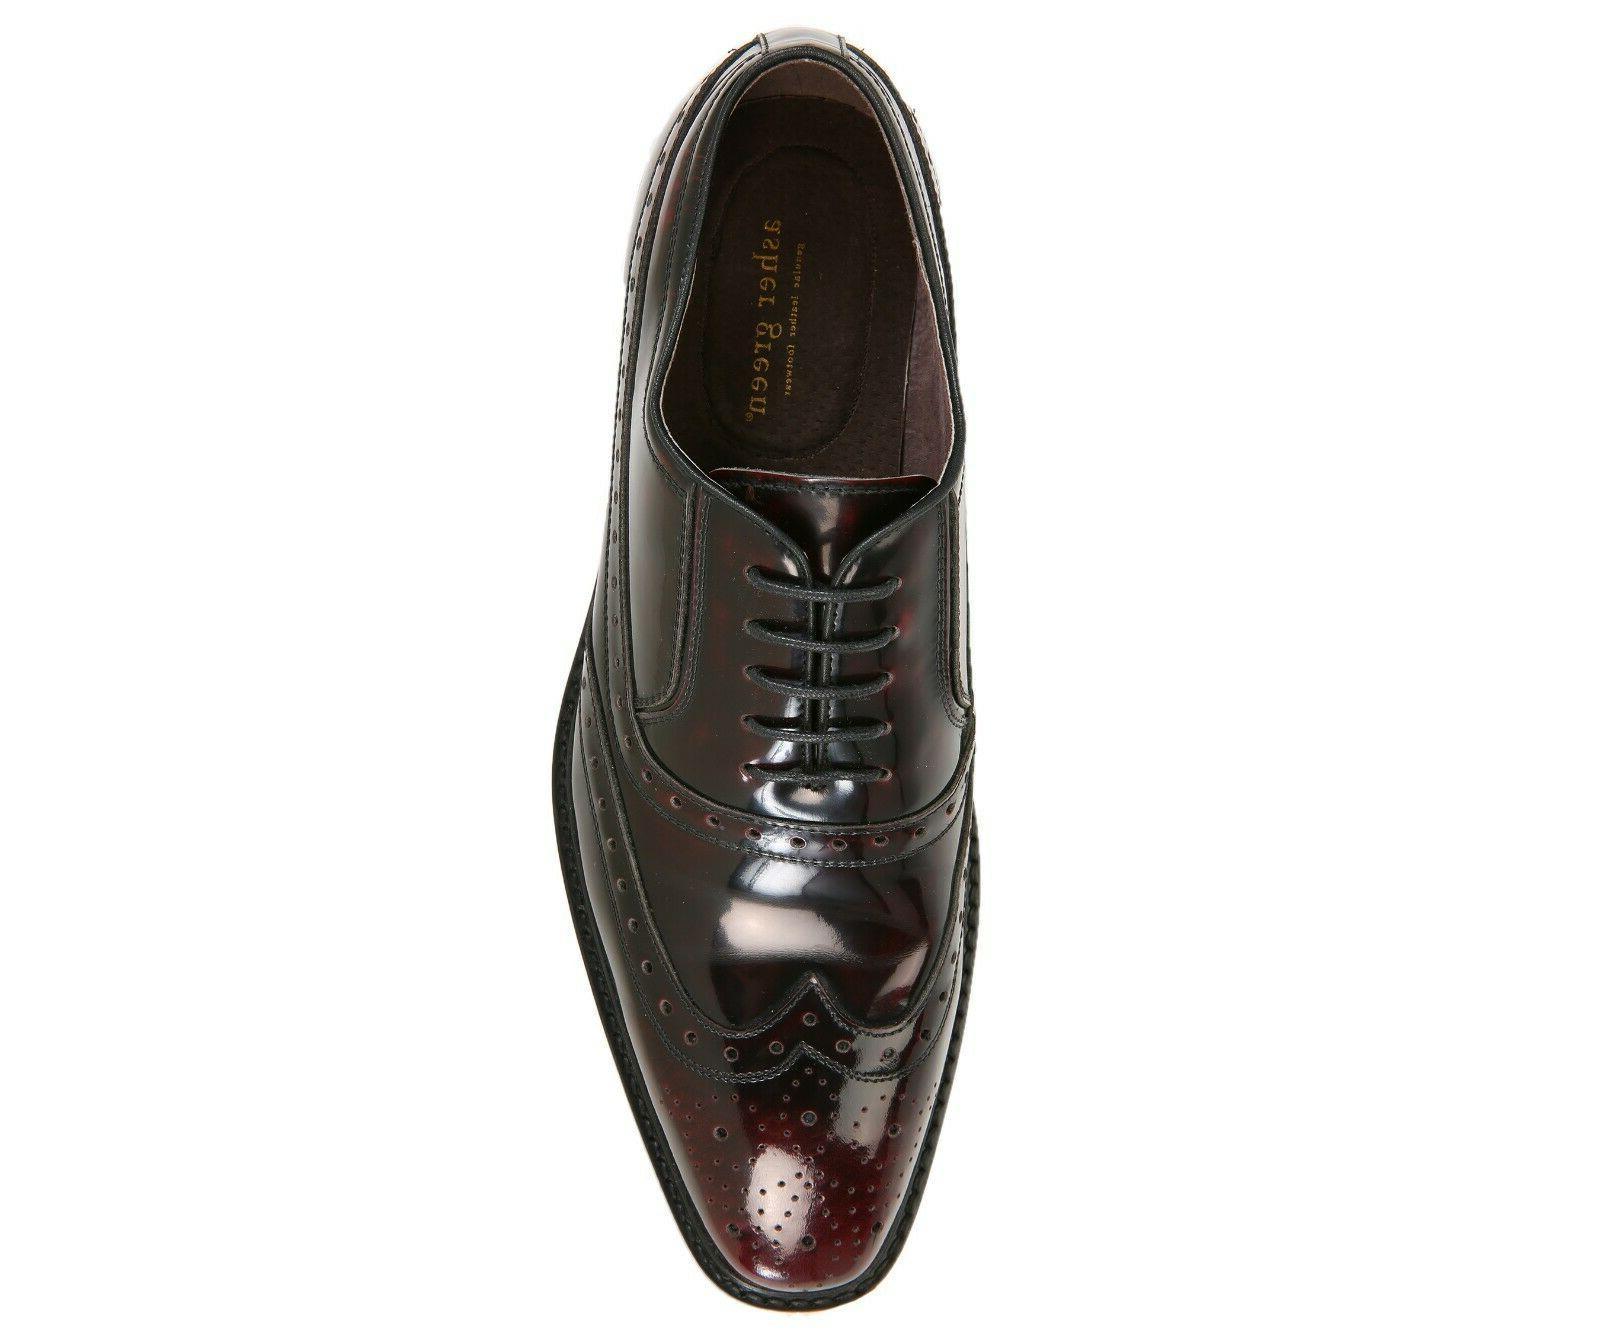 1761ec21fcbe4 Asher Green Mens Burgundy Genuine Box Calf Leather